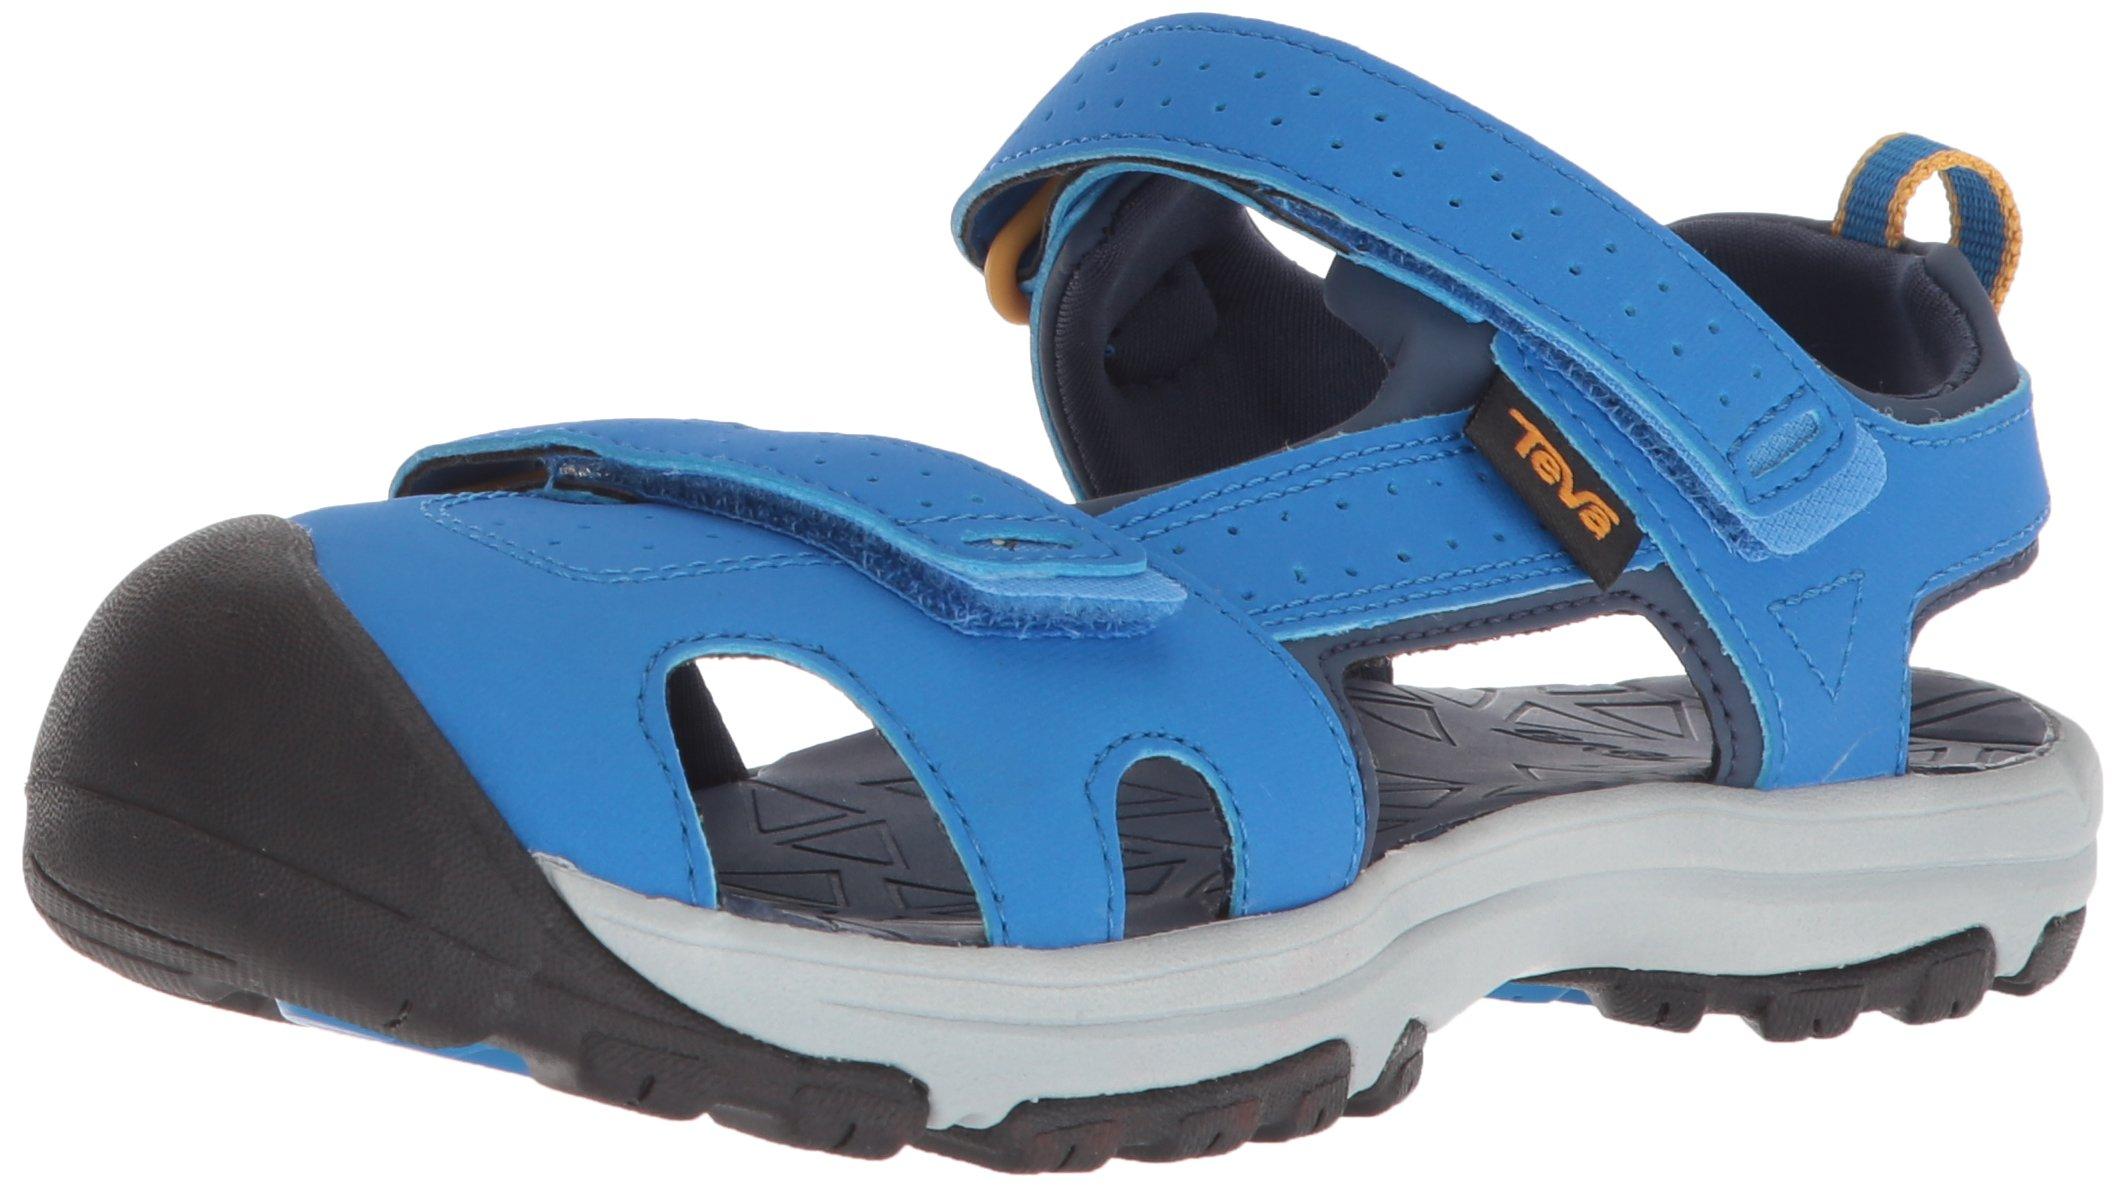 Teva Boys' K Hurricane Toe PRO Sport Sandal Dazzling Blue 12 M US Little Kid